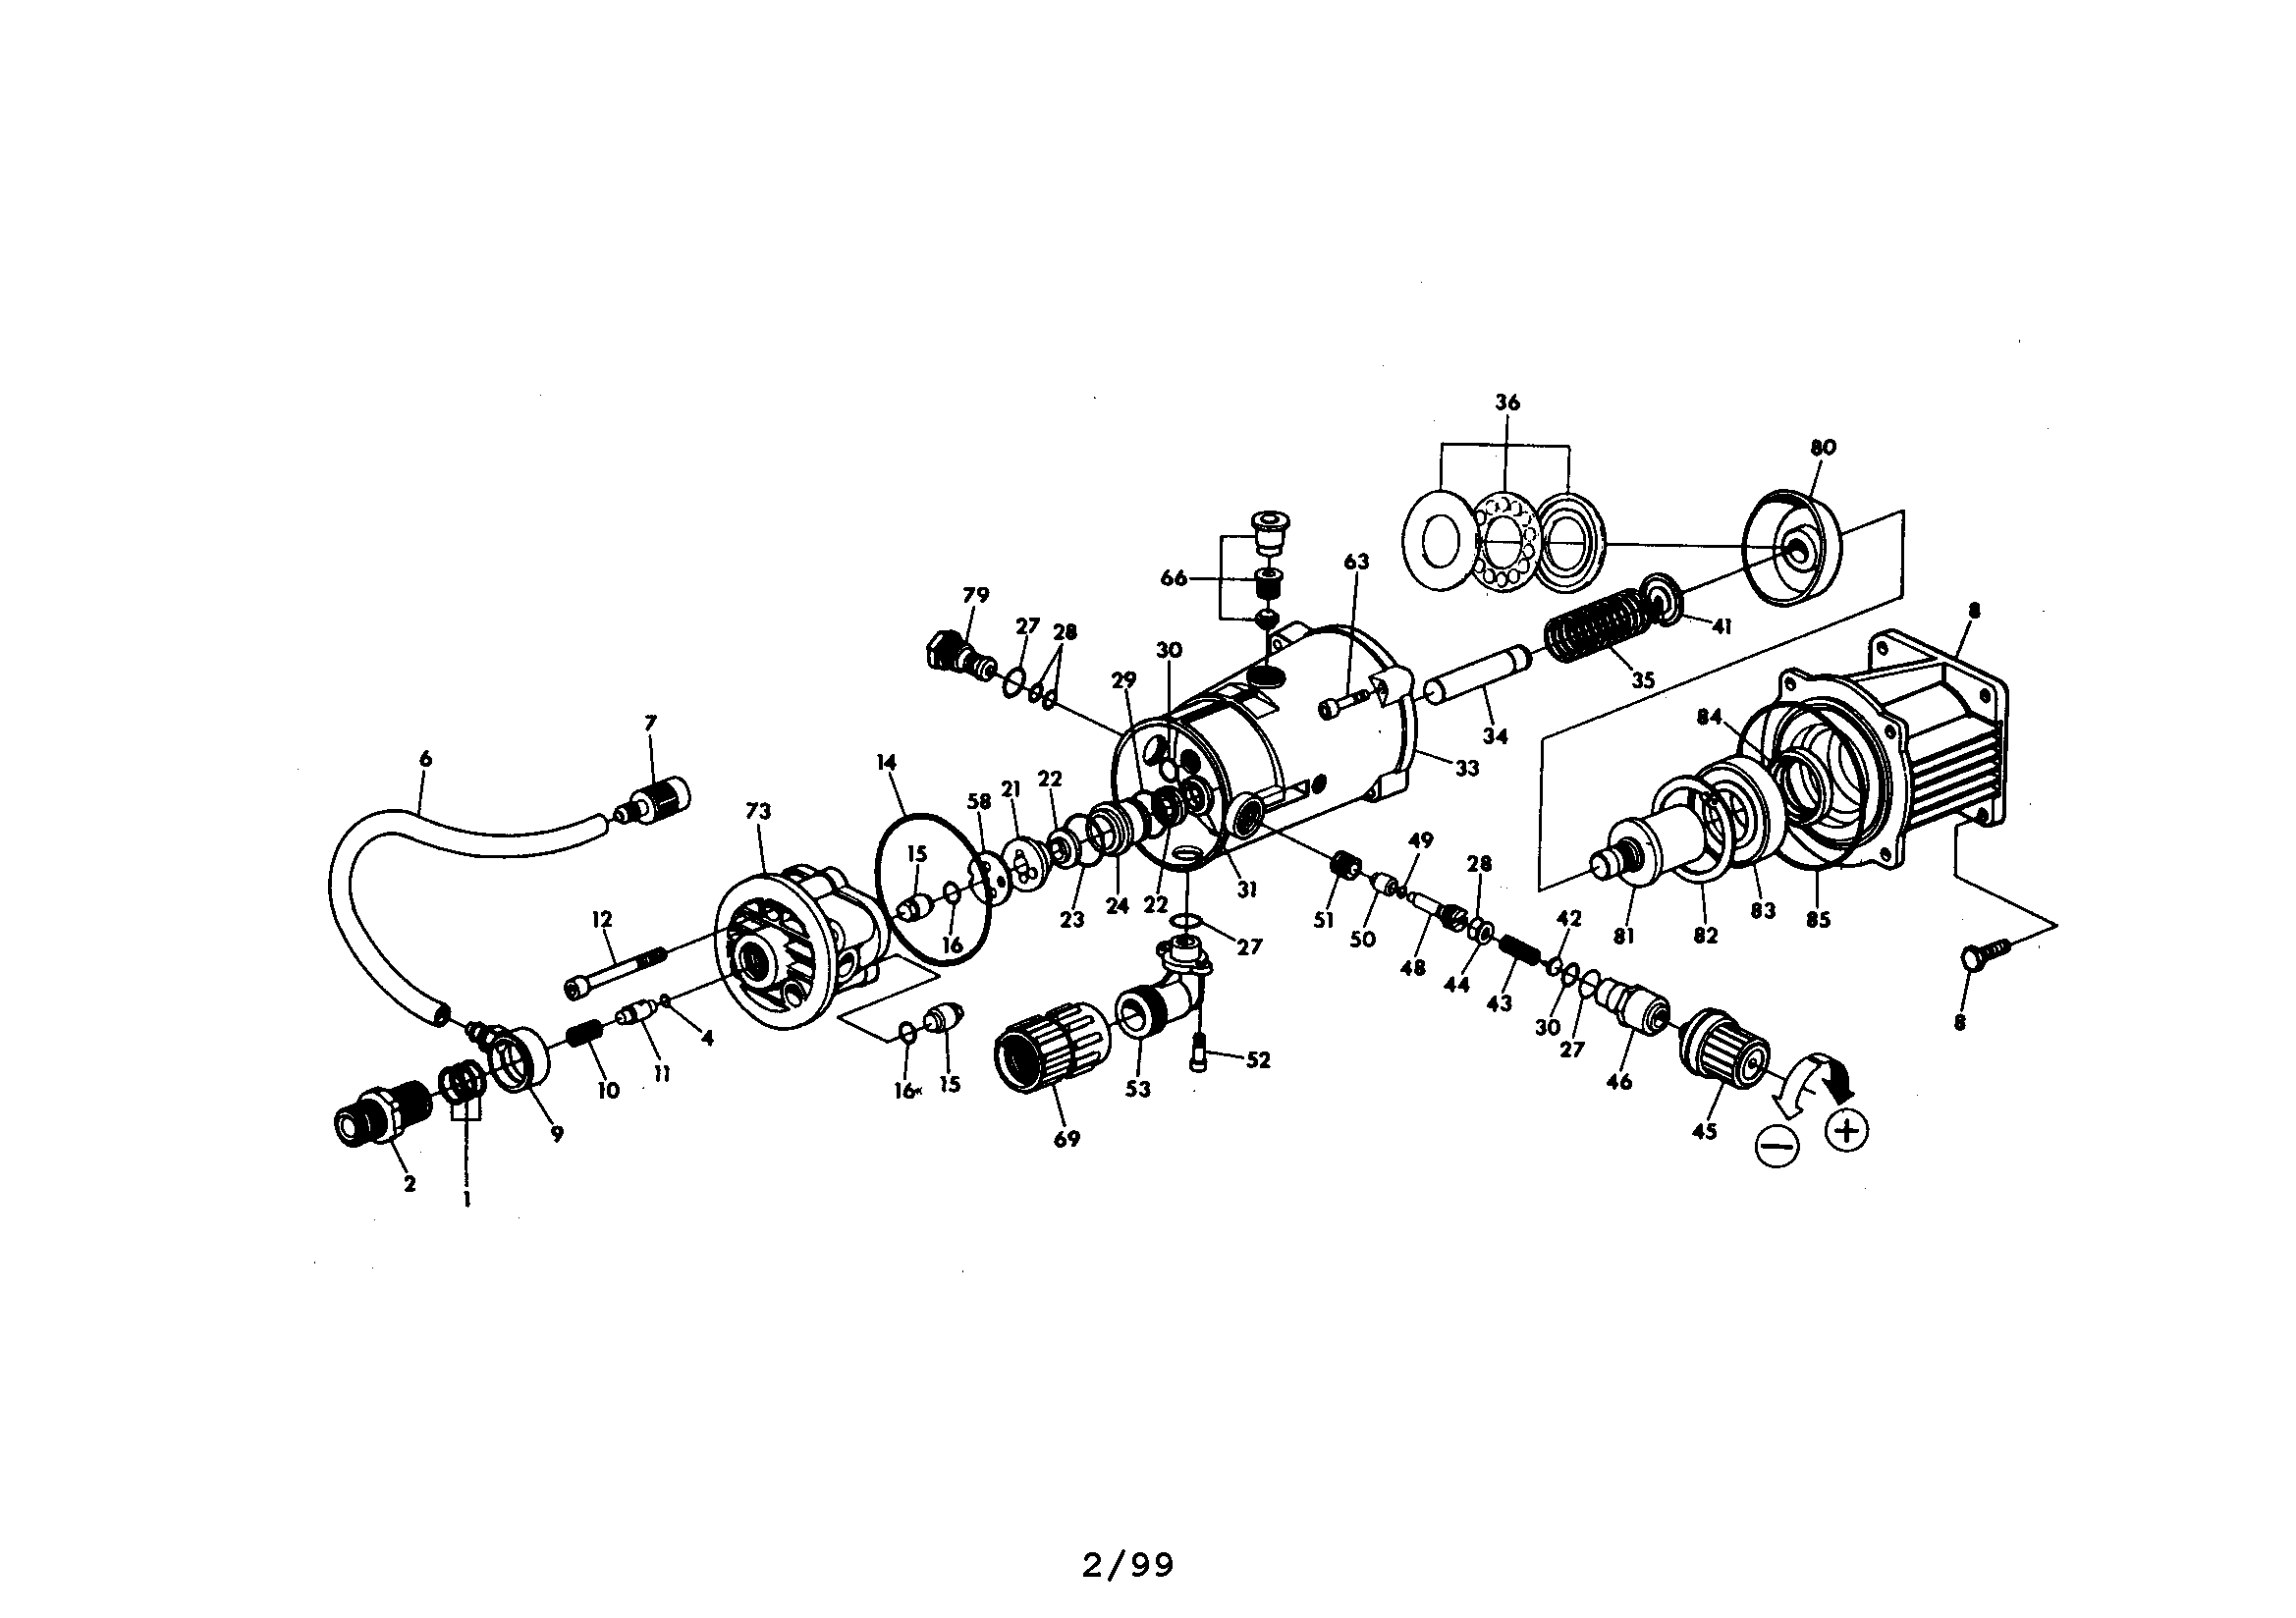 Generac pressure washer pump diagram